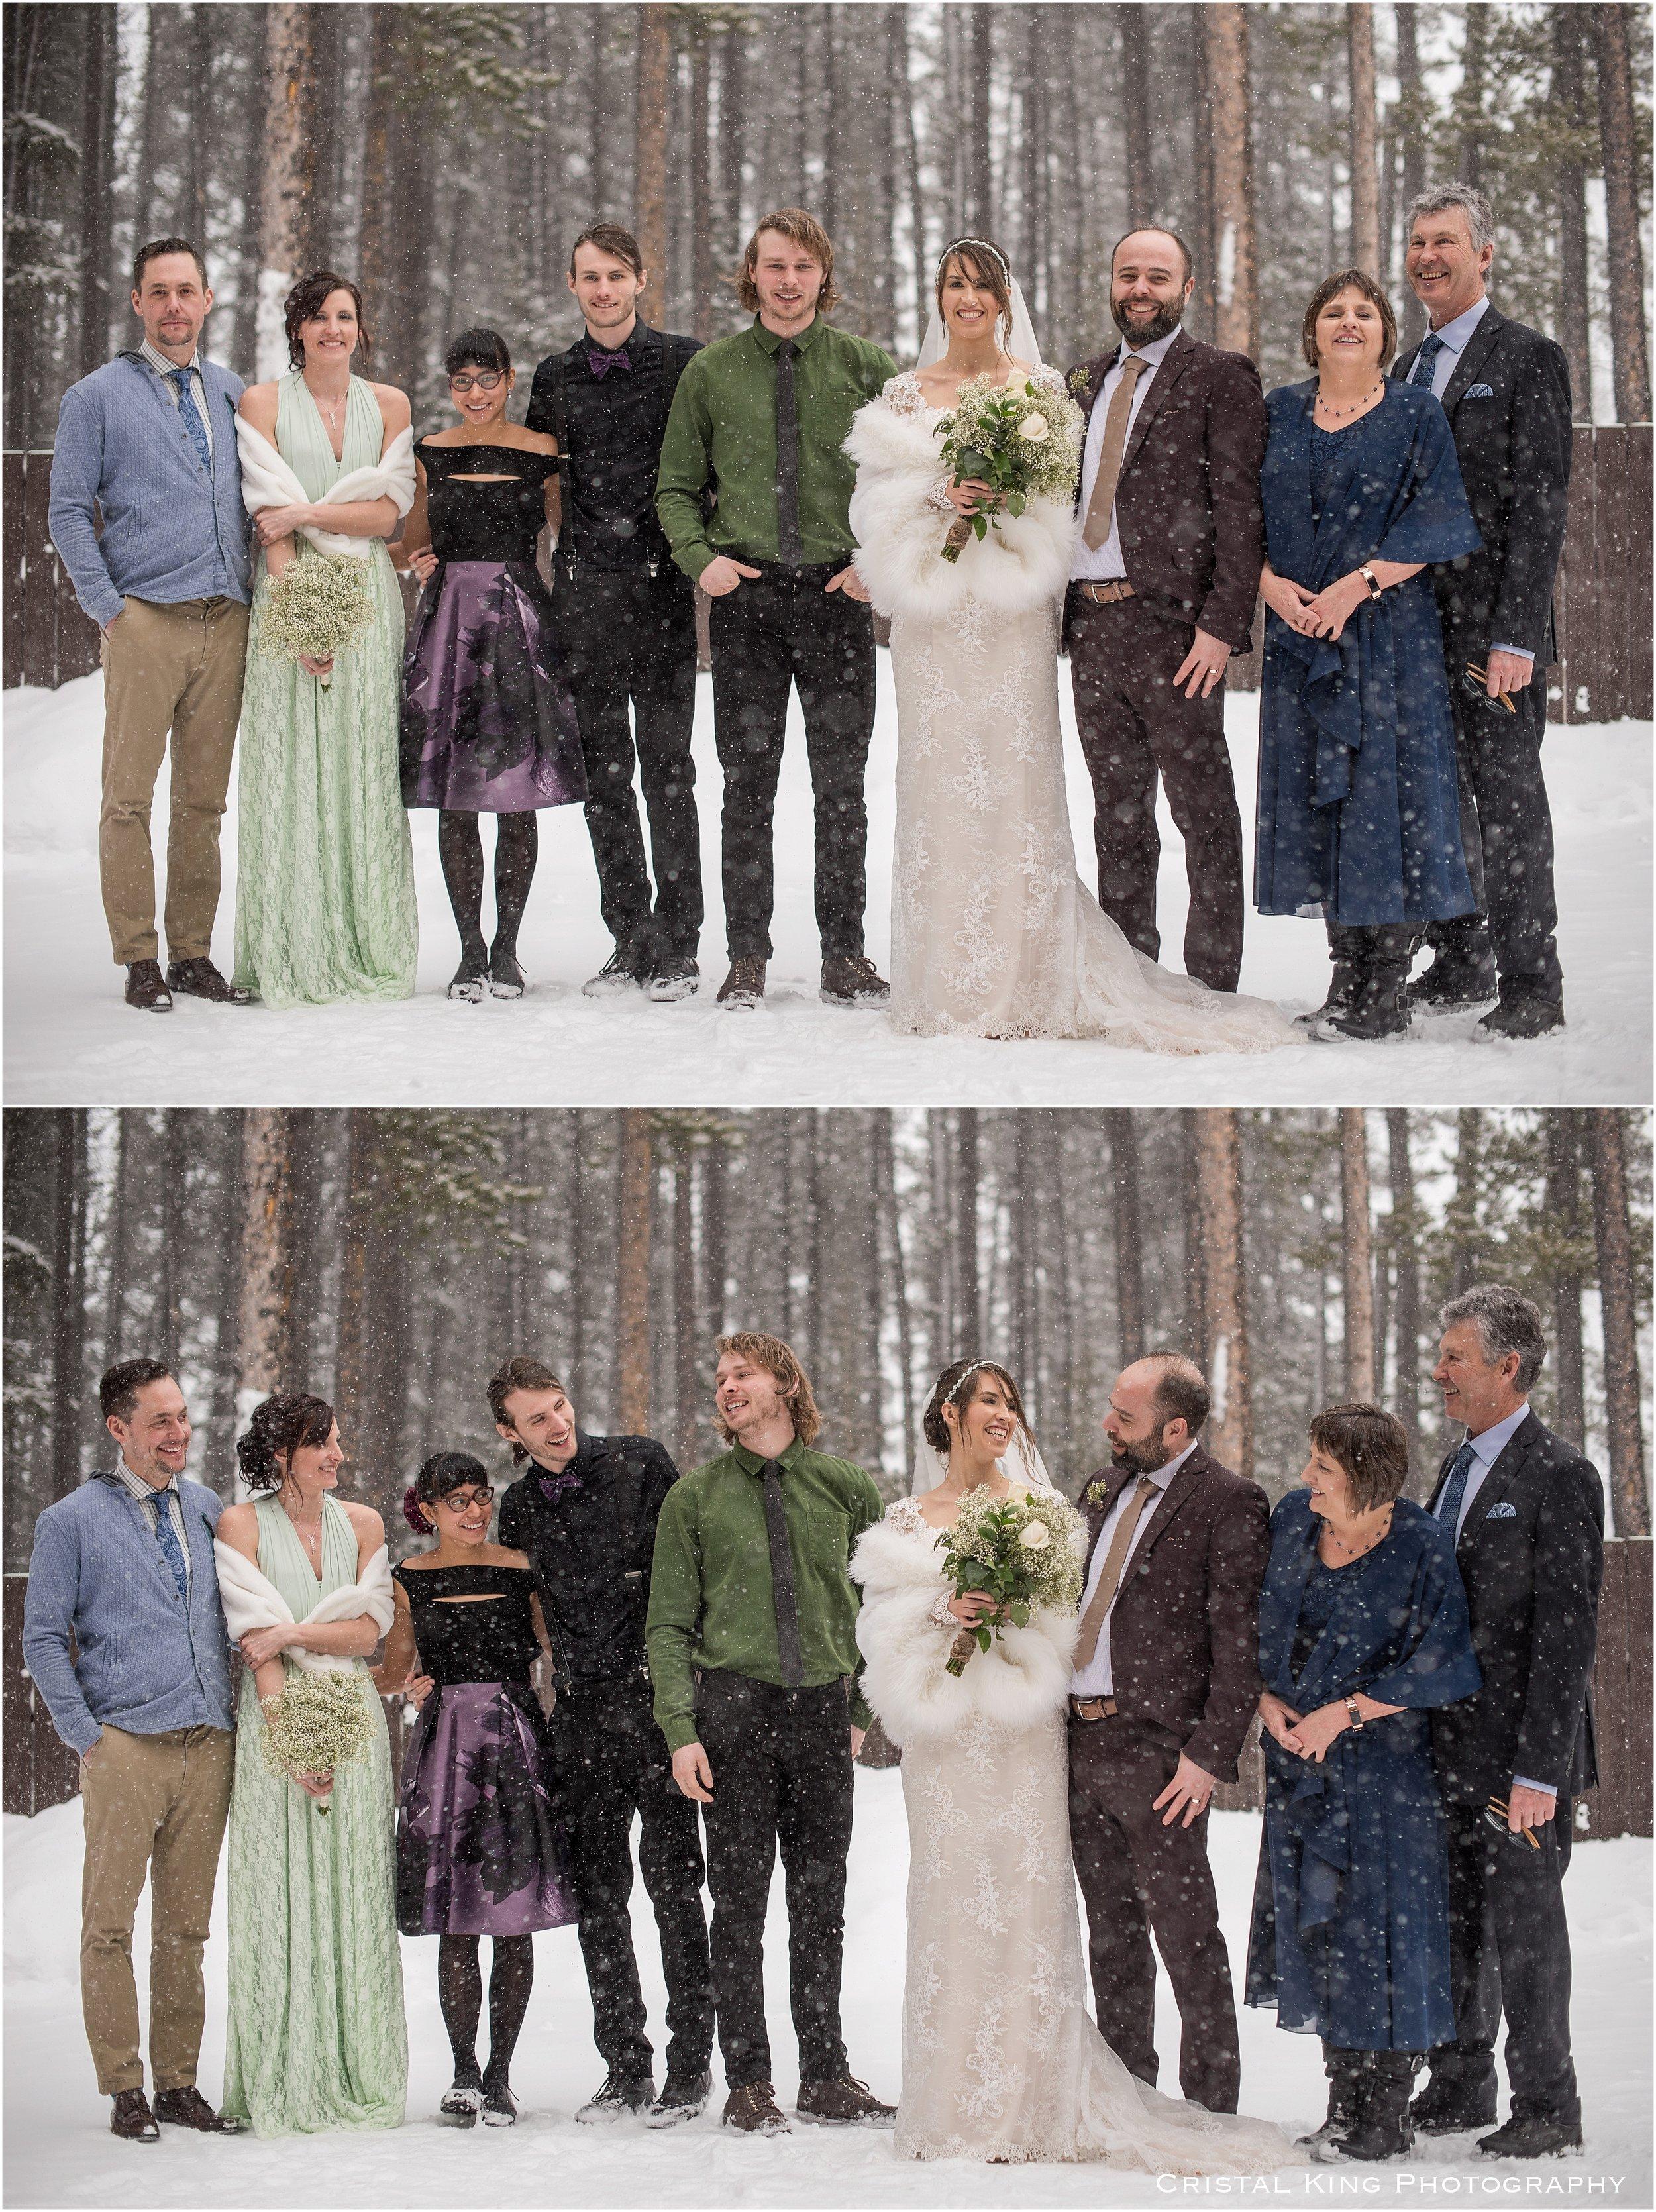 Jacqueline-Jasons-Wedding-39.jpg